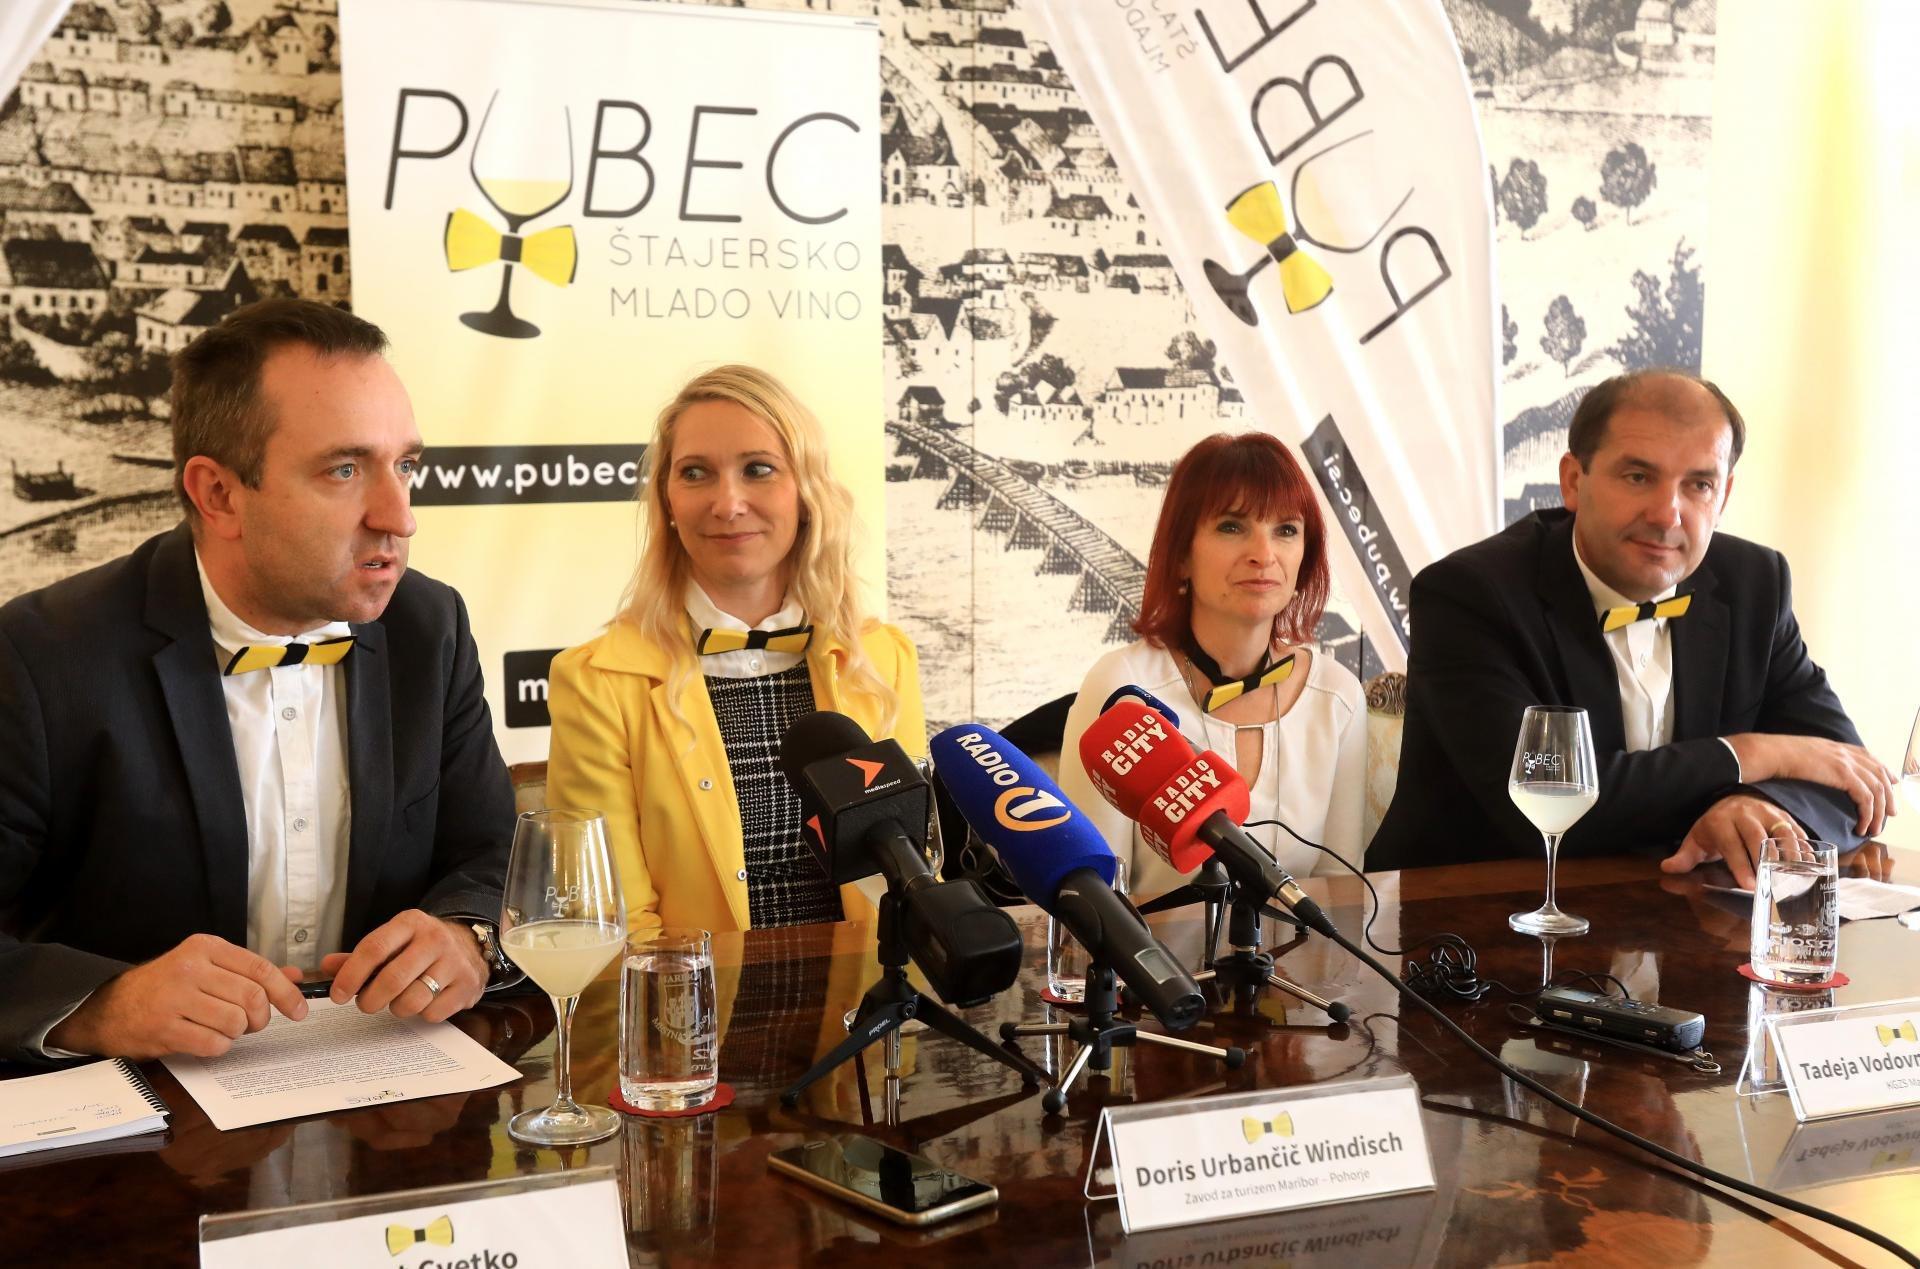 Projekt Pubec - Štajersko mlado vino v svoji tretji sezoni združuje 30 štajerskih vinarjev.